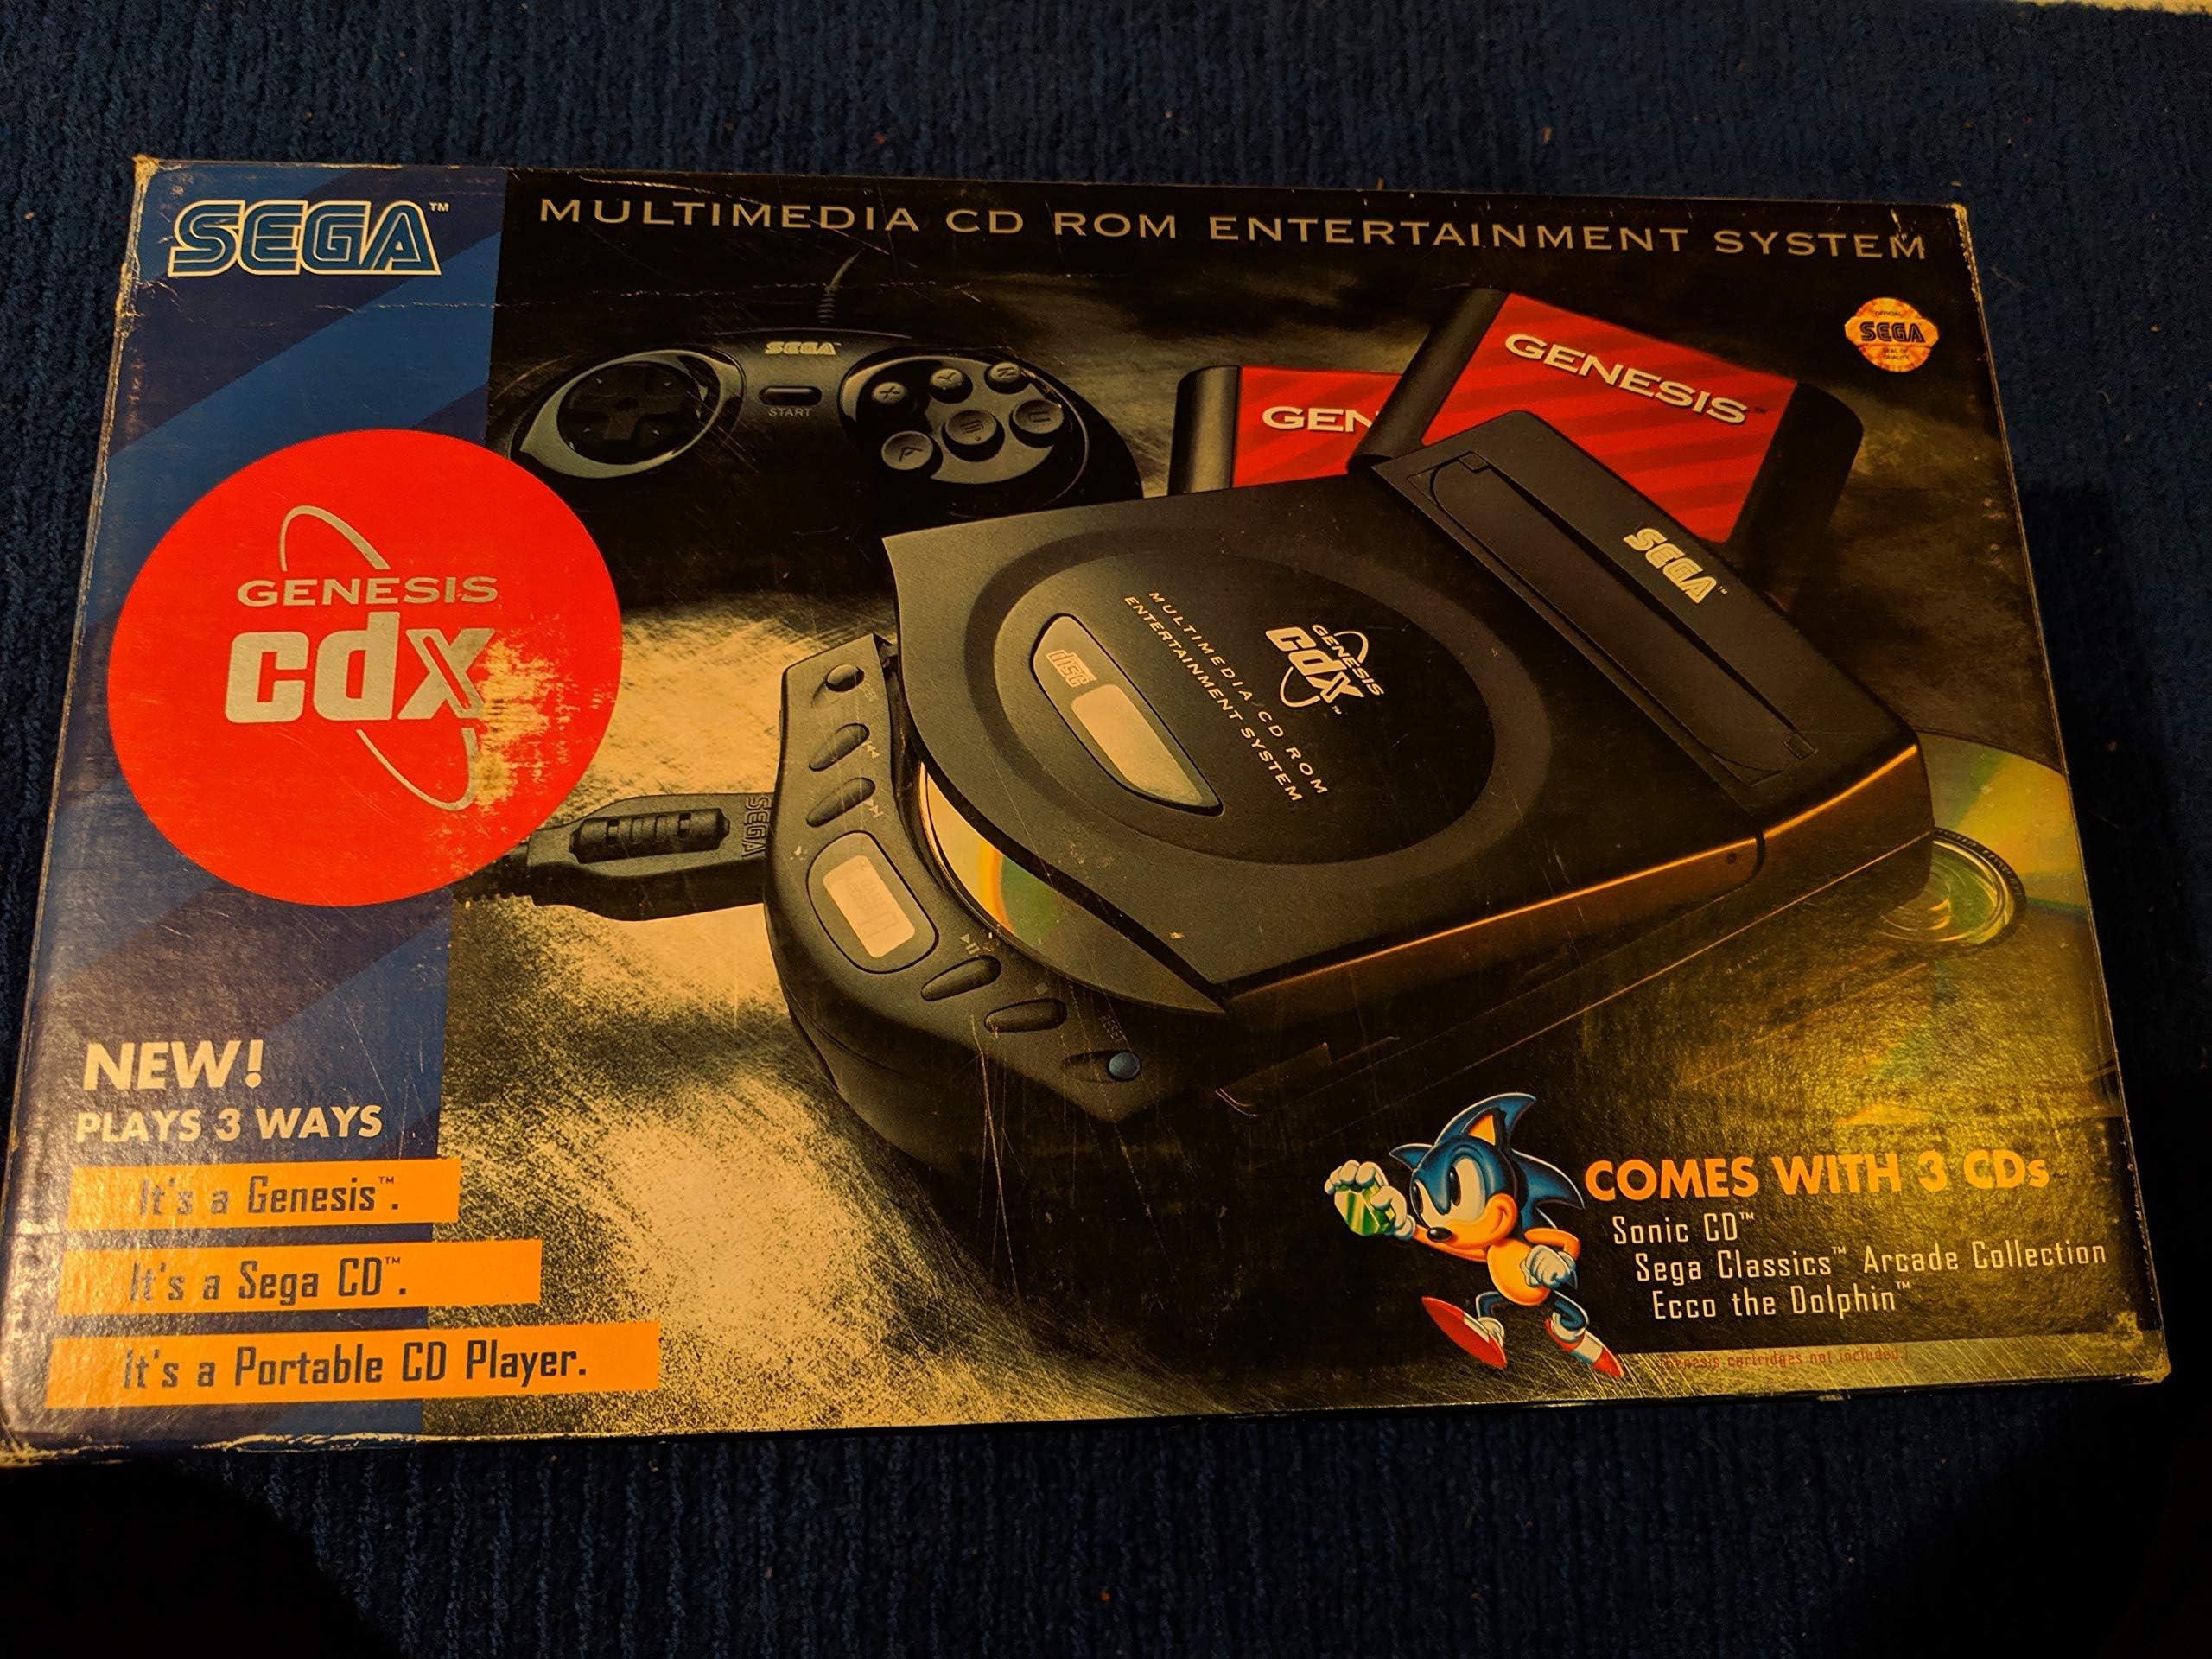 Amazon com: Sega Genesis CDX Multimedia CD-ROM Entertainment